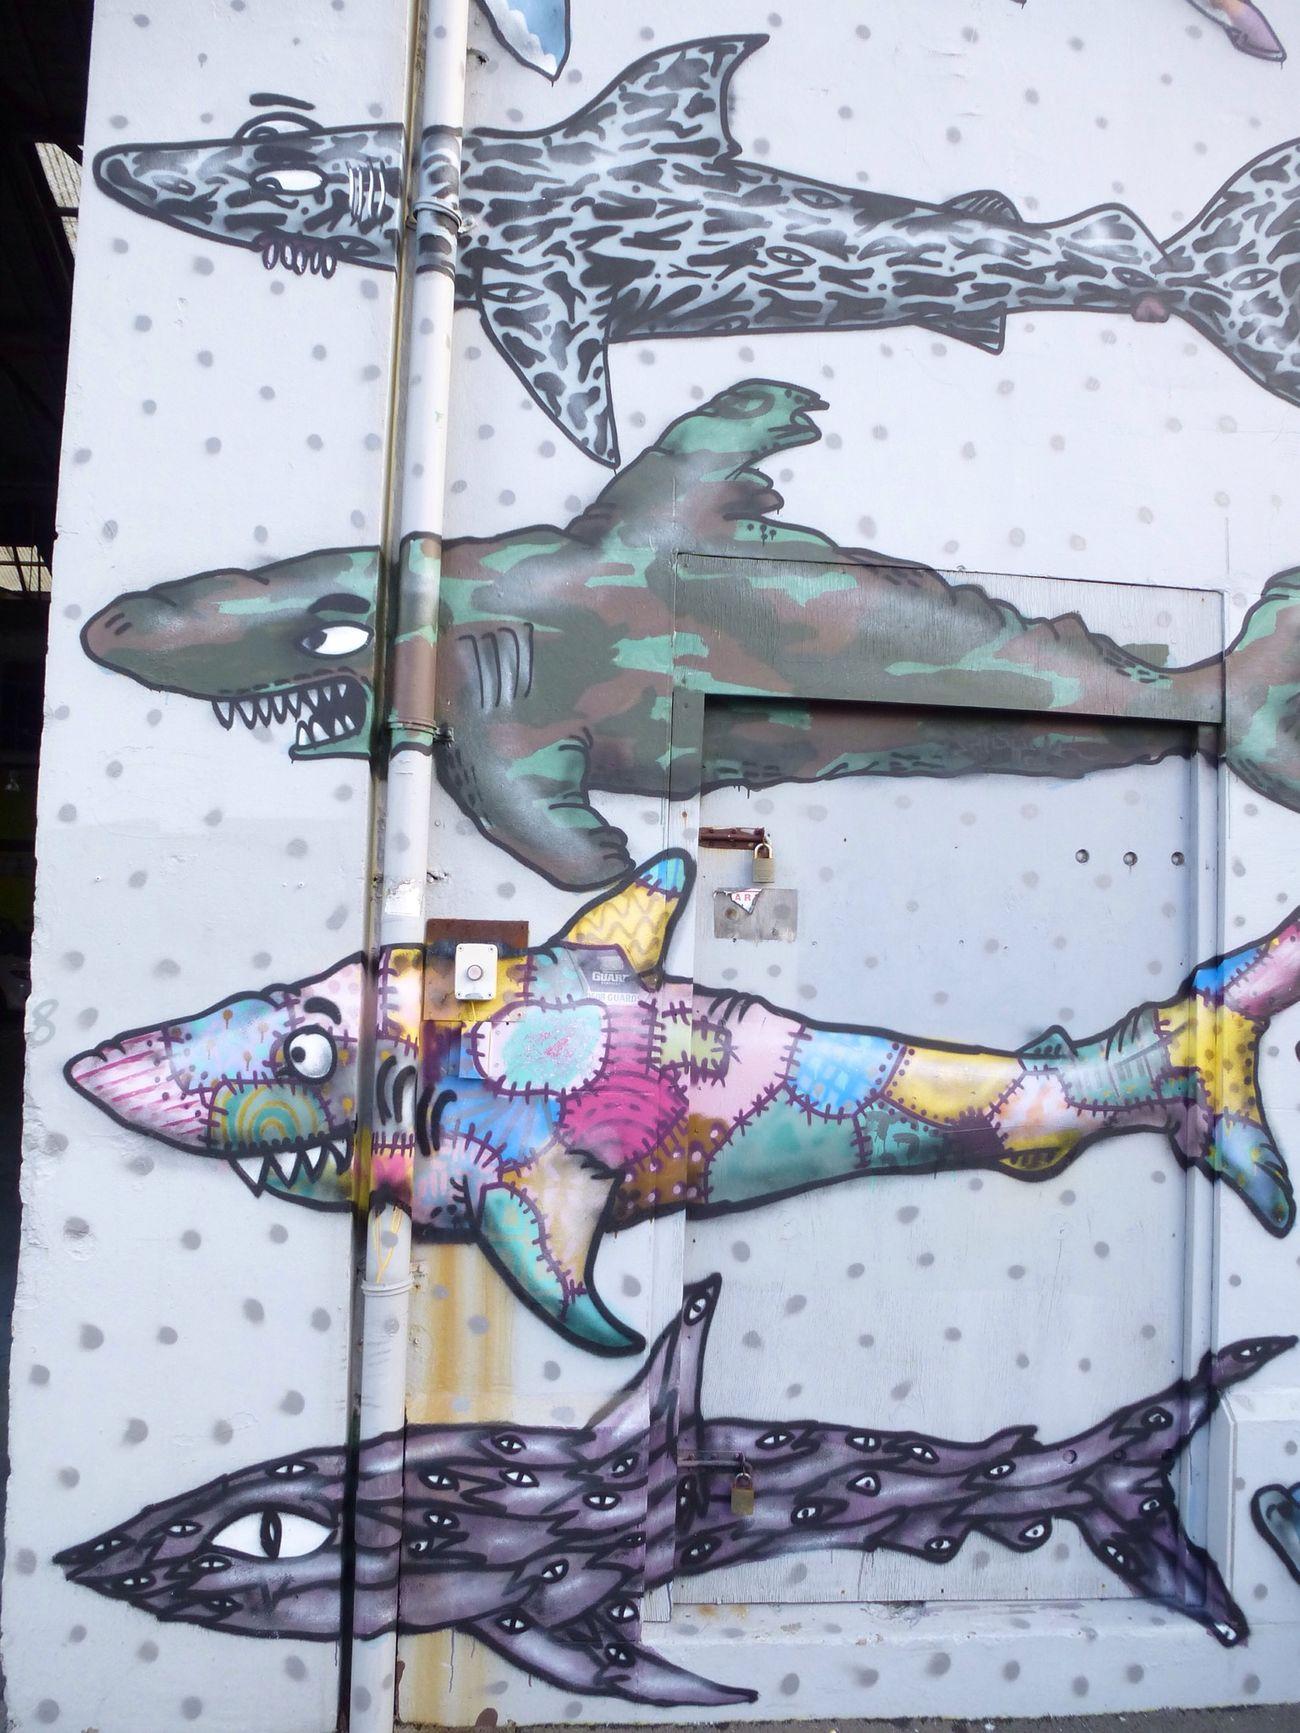 Shark Protest Wellington  Newzealand Wanderlust Ontheroad Savesharks Travel City